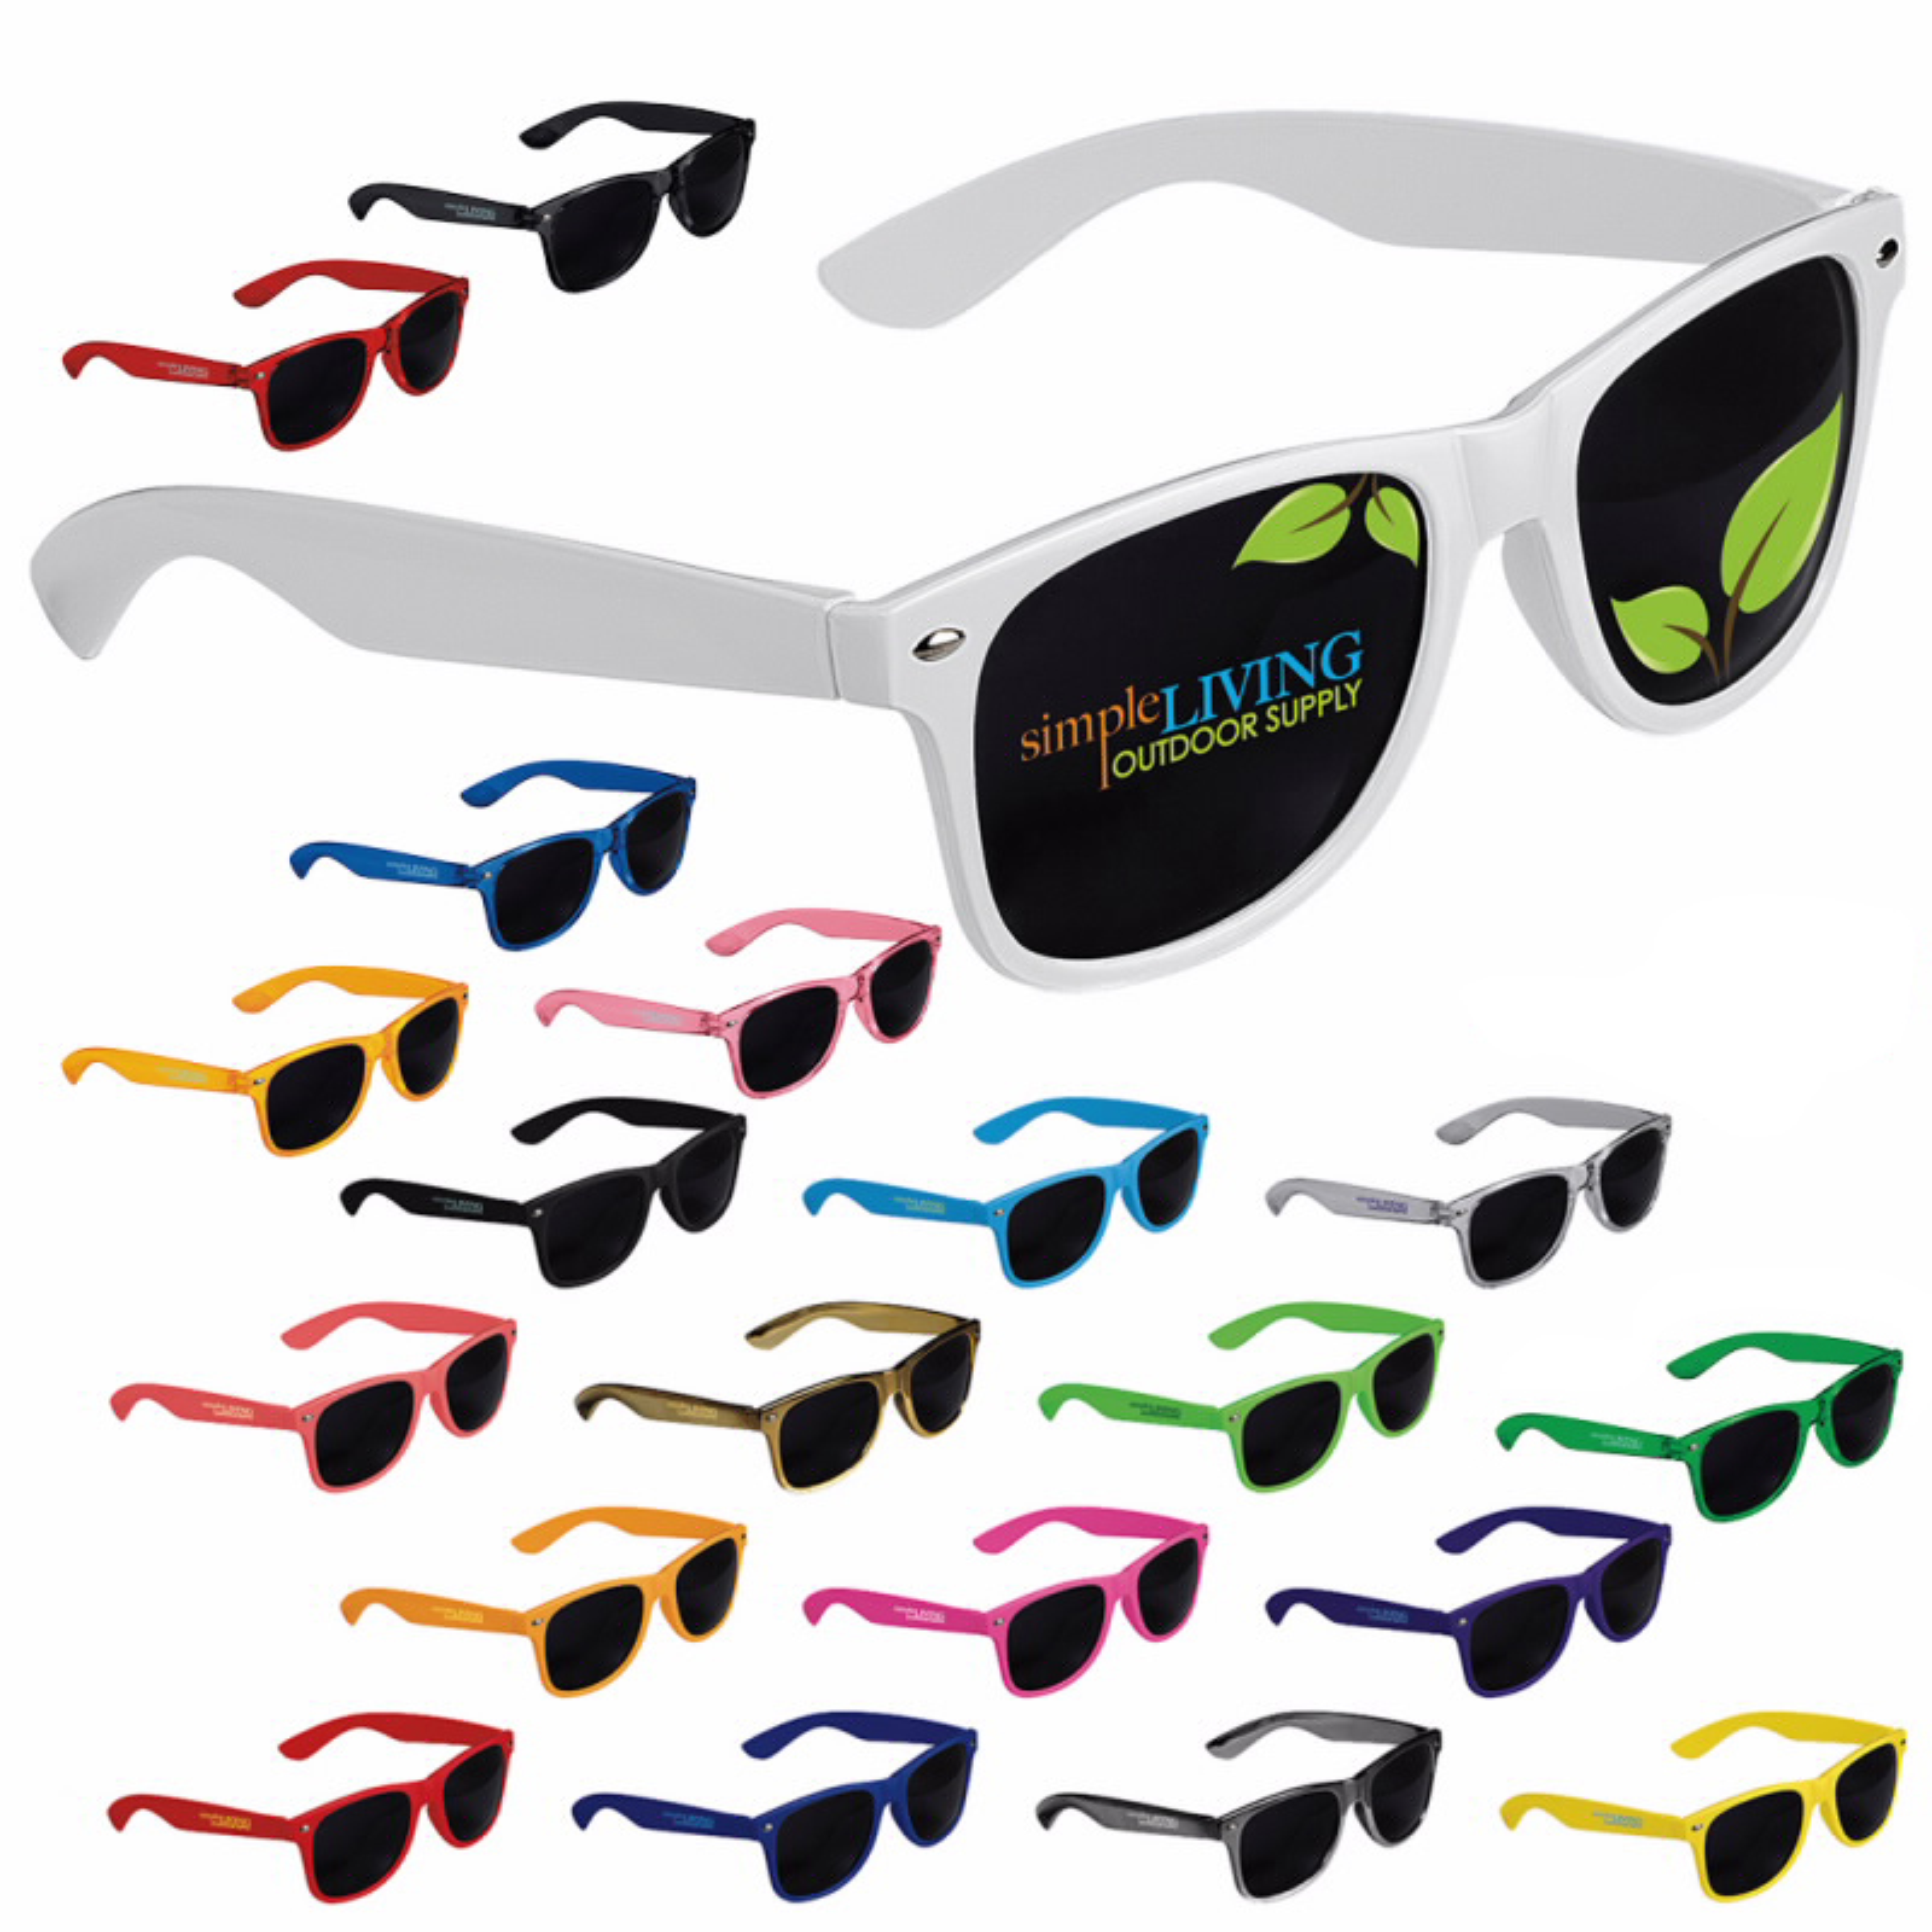 GoodValue Cool Vibes Dark Lens Sunglasses, #26050, 1 Colour Imprint